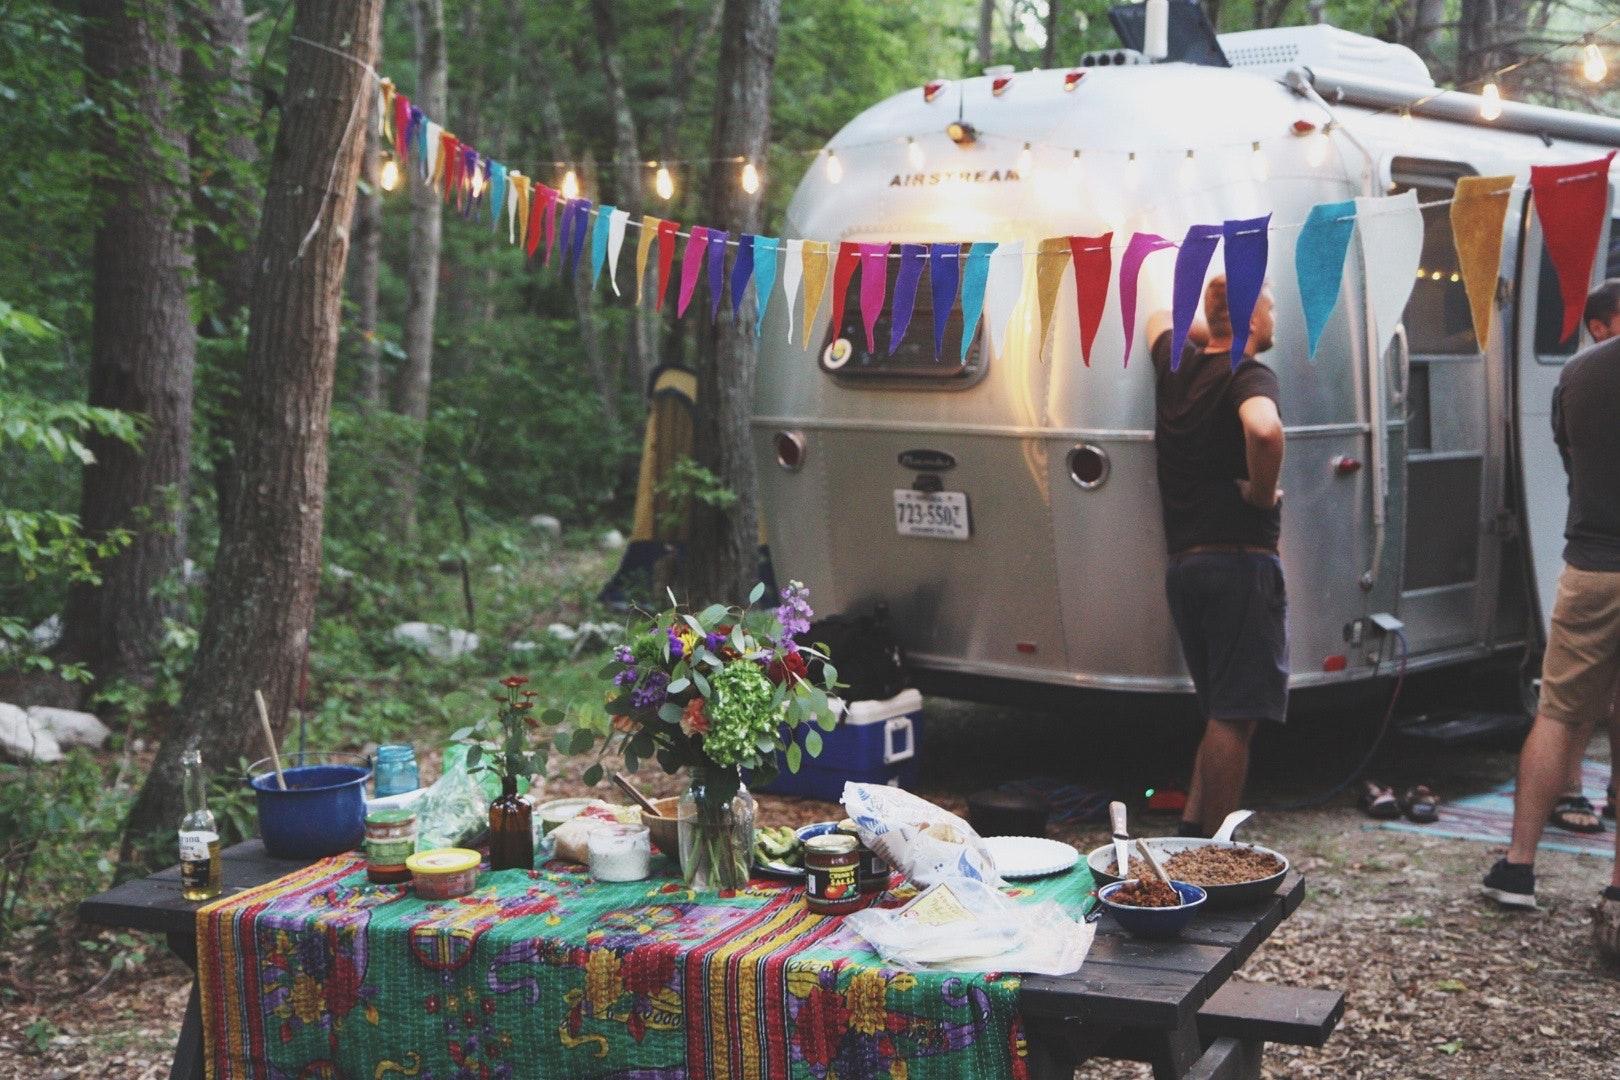 Tiny-Home-Big-Kitchen-Airstreamphoto-5